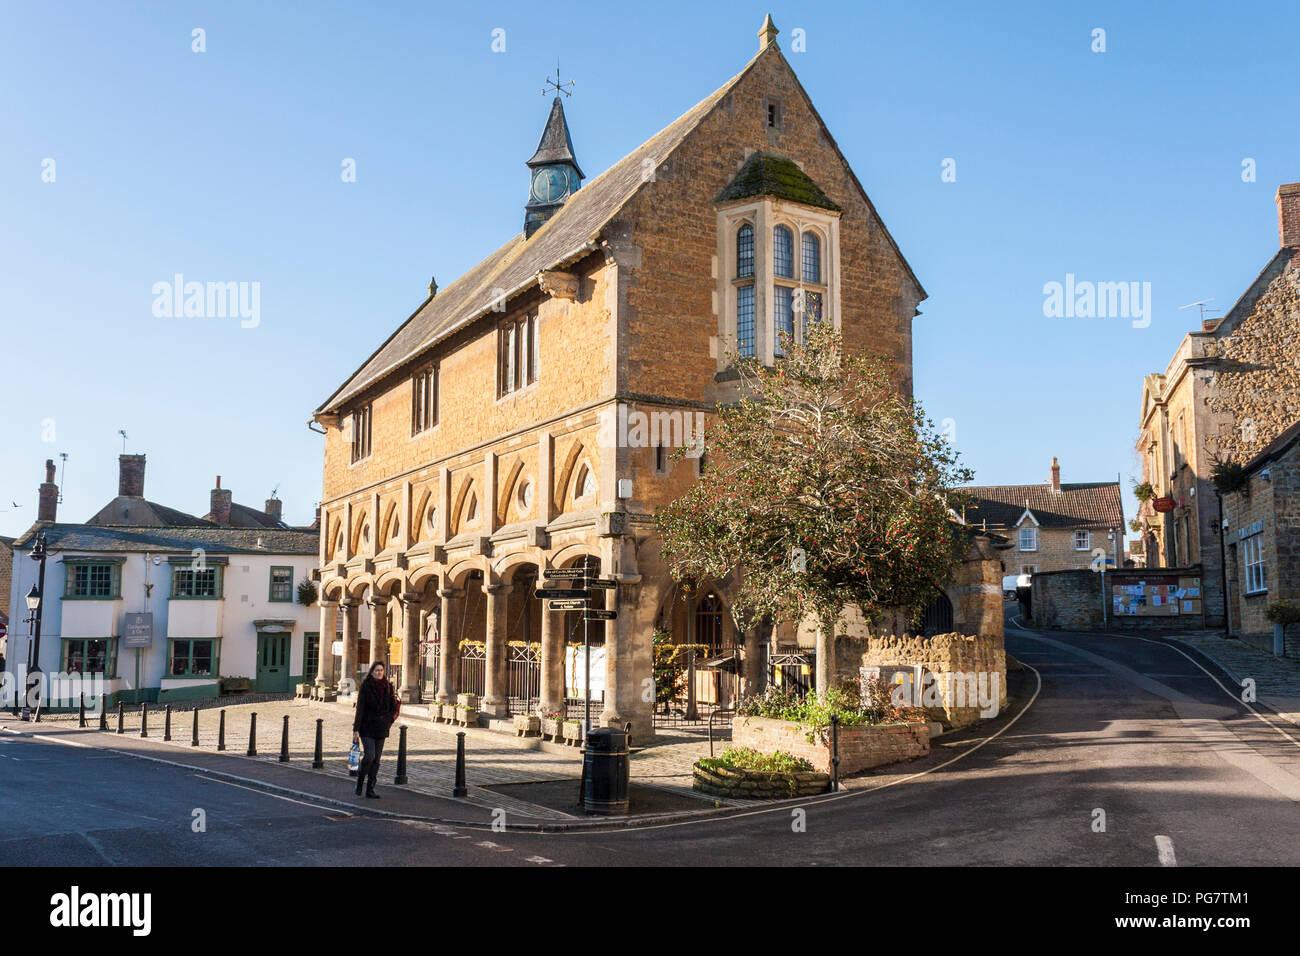 The Market House, Castle Cary, Somerset, England, GB, UK Stock Photo